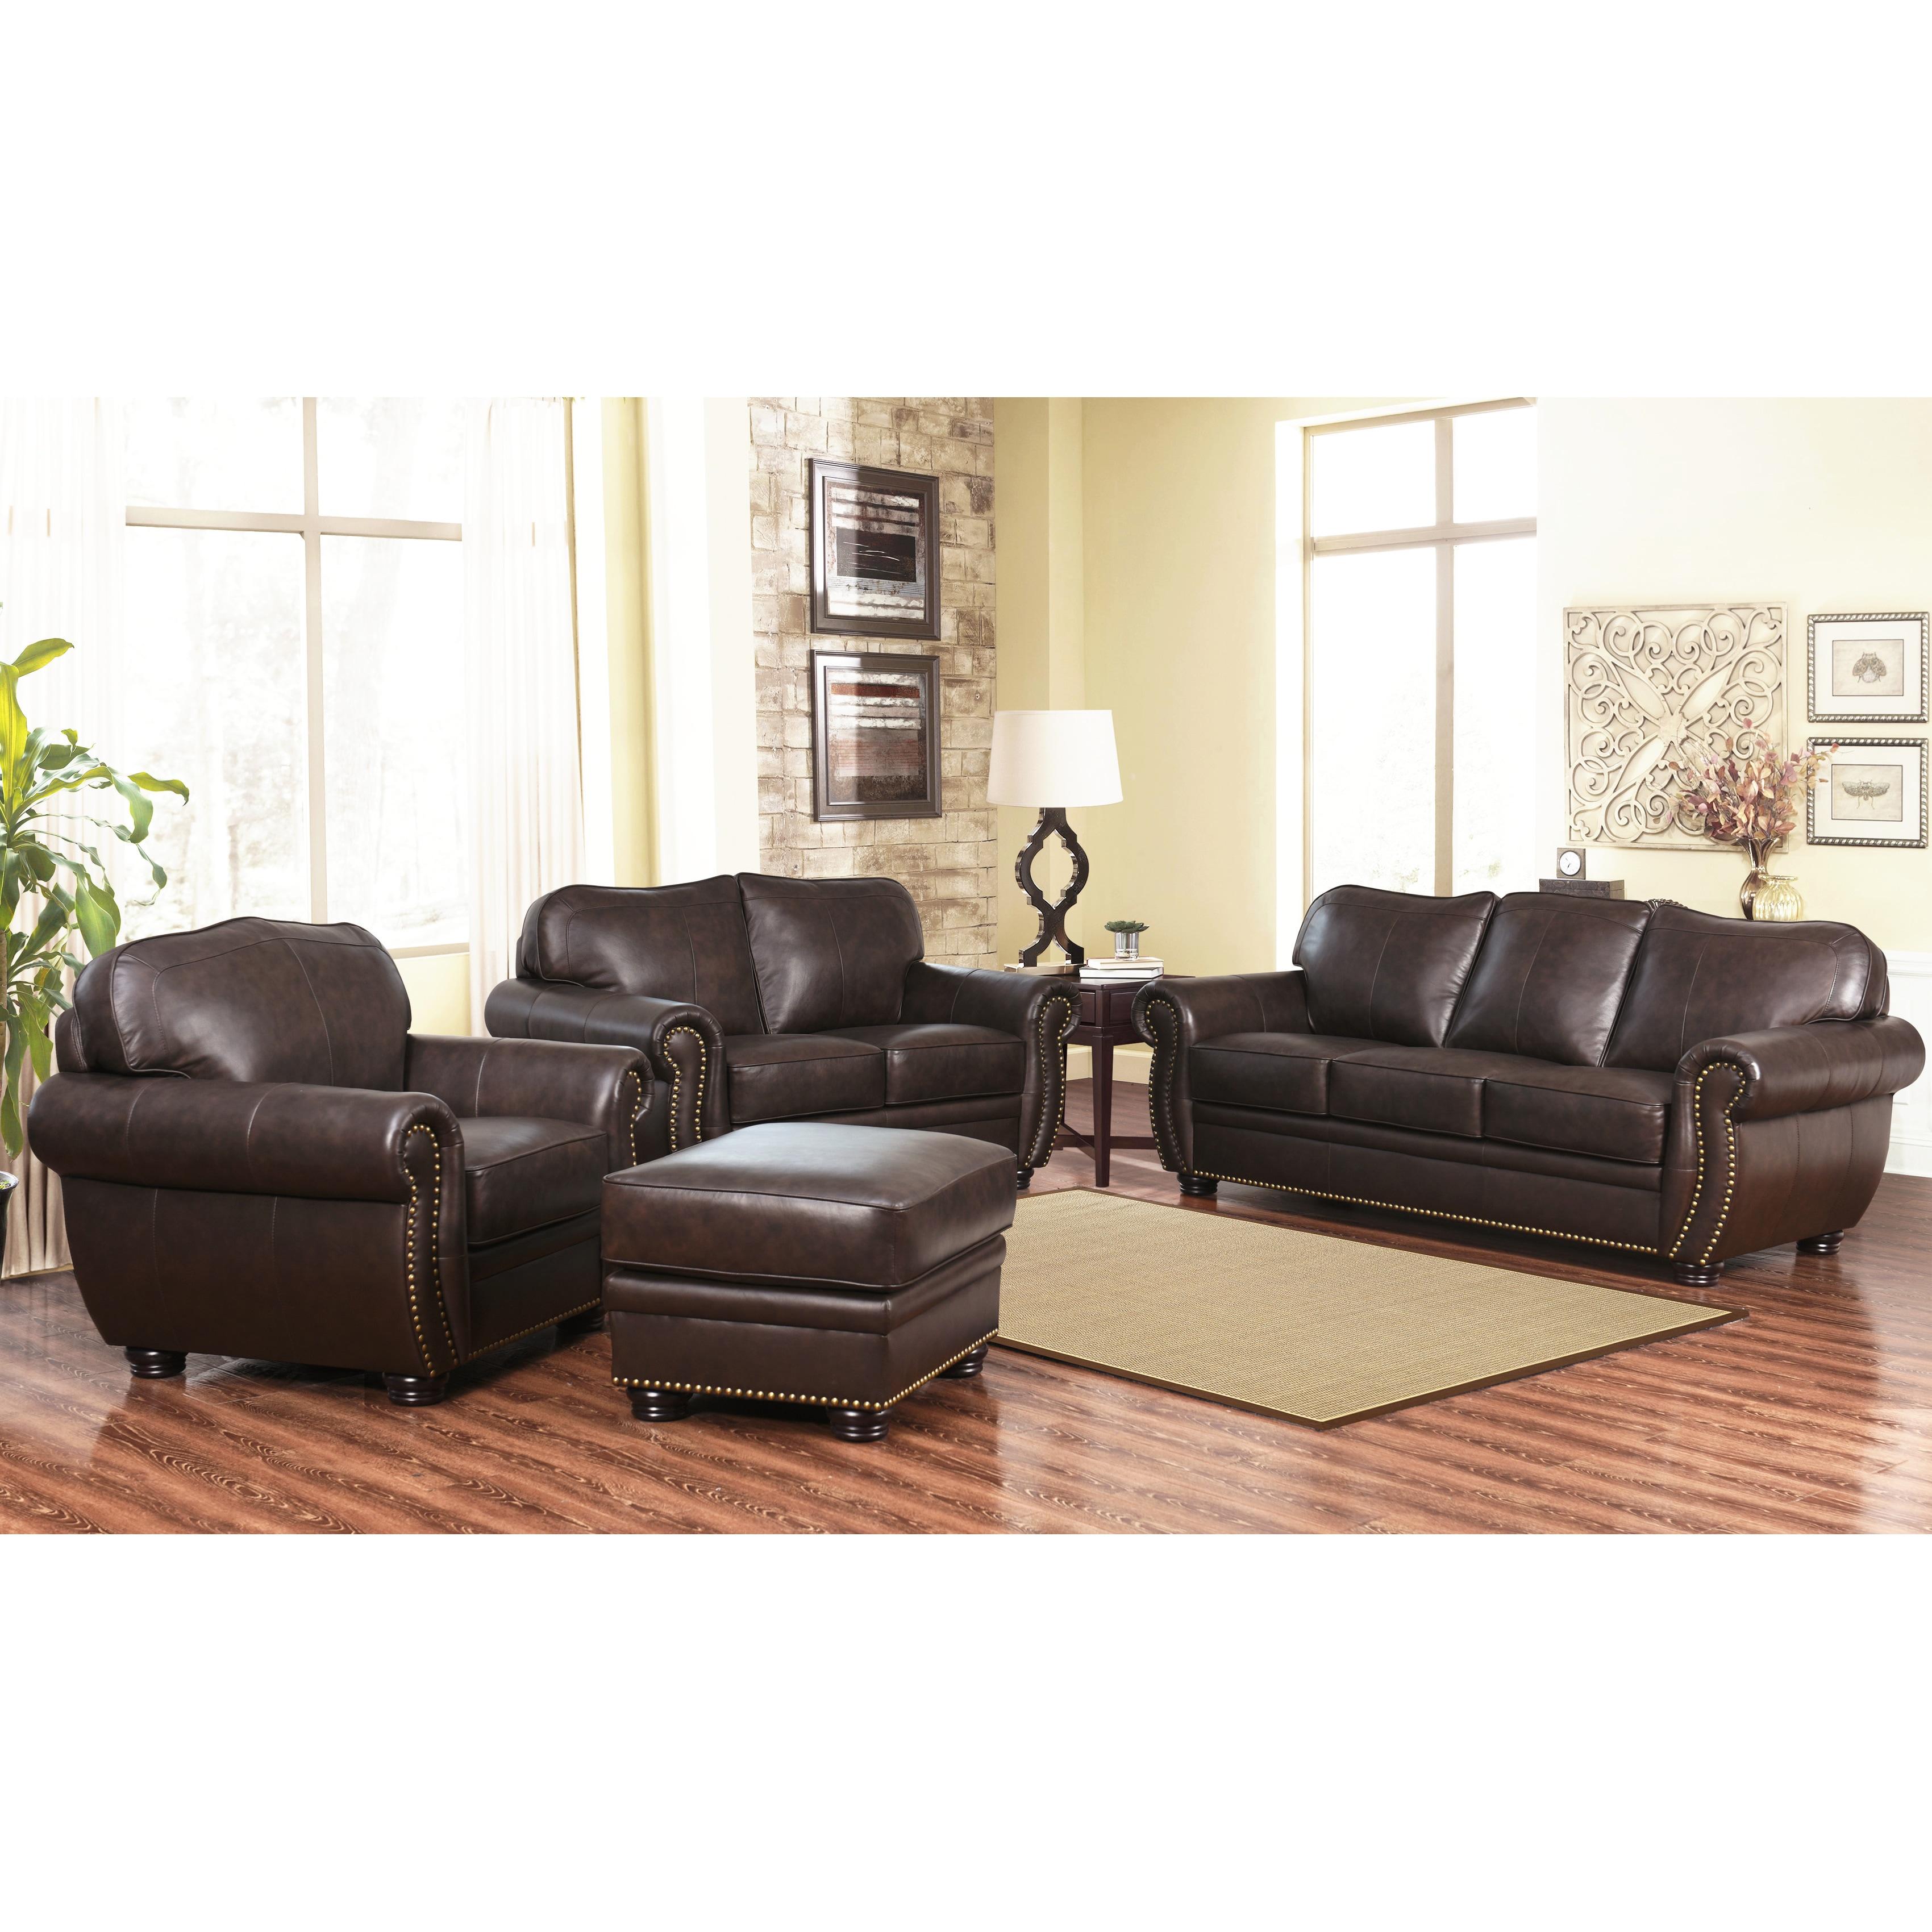 Abbyson Richfield 4 Piece Top Grain Leather Sofa Loveseat Armchair Ottoman Set